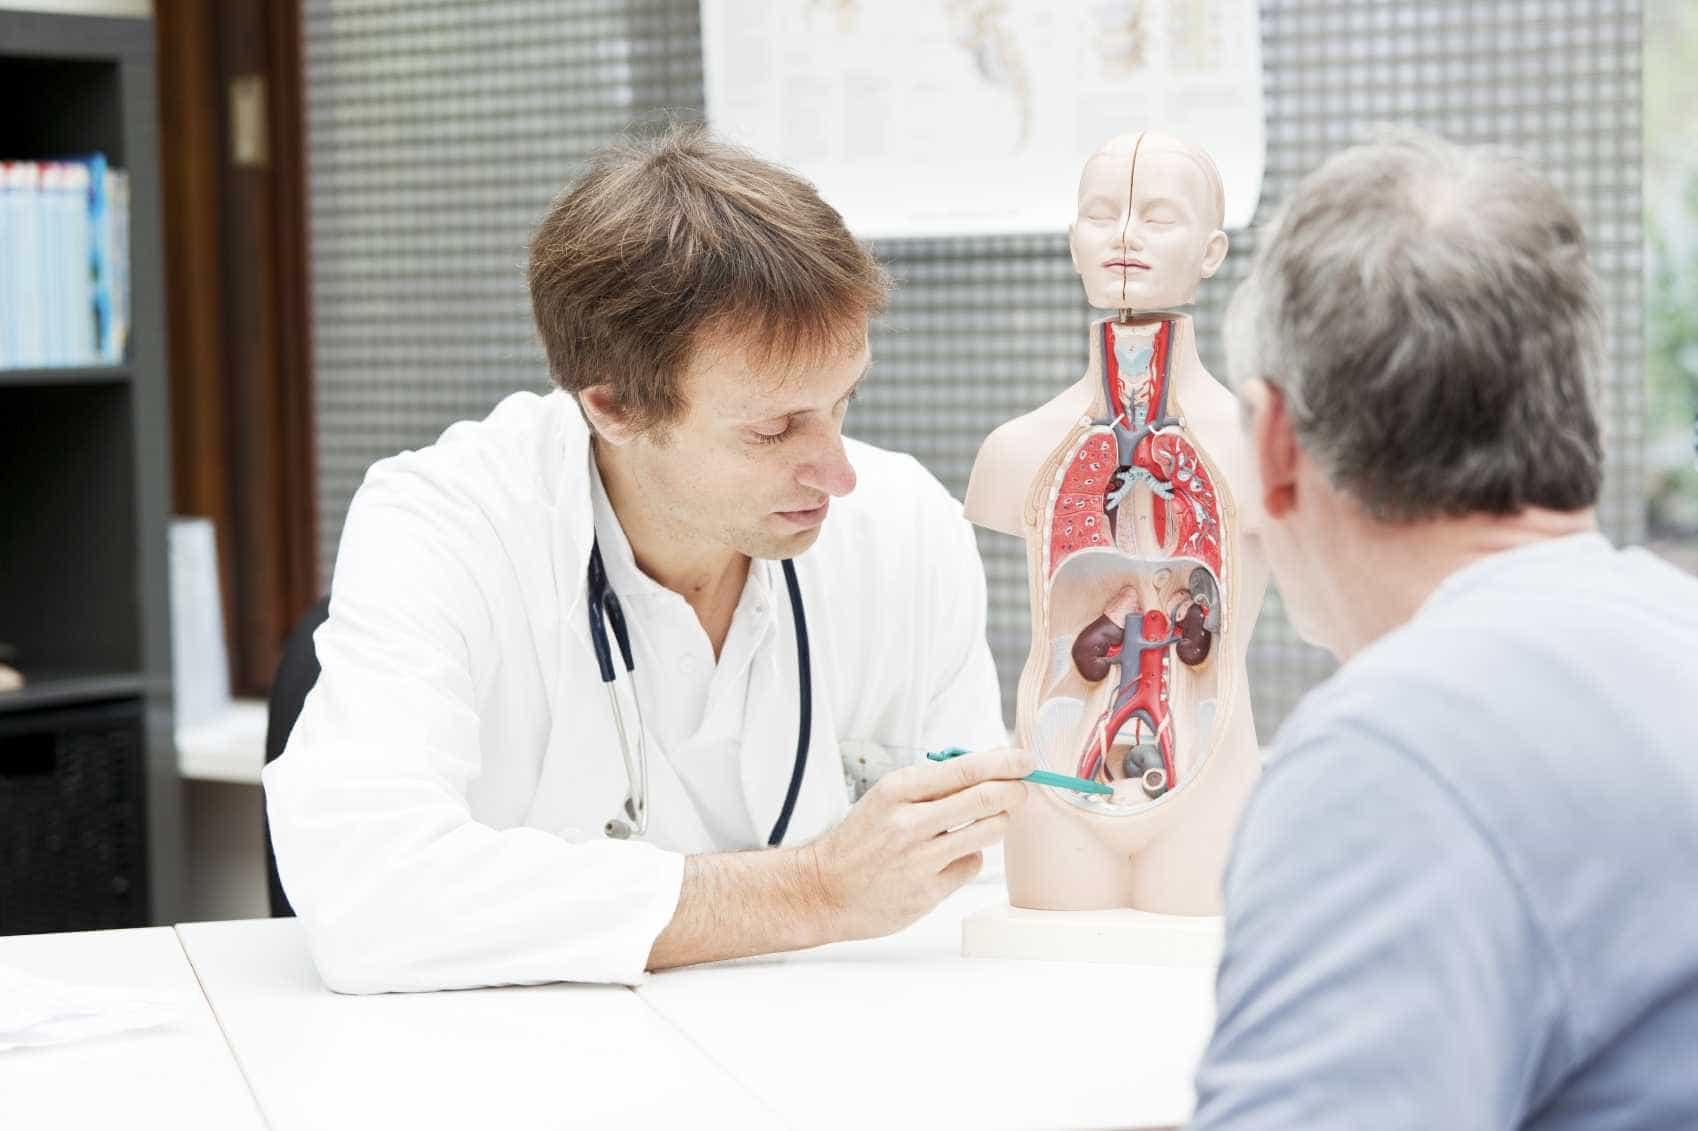 врач уролог андролог на приеме